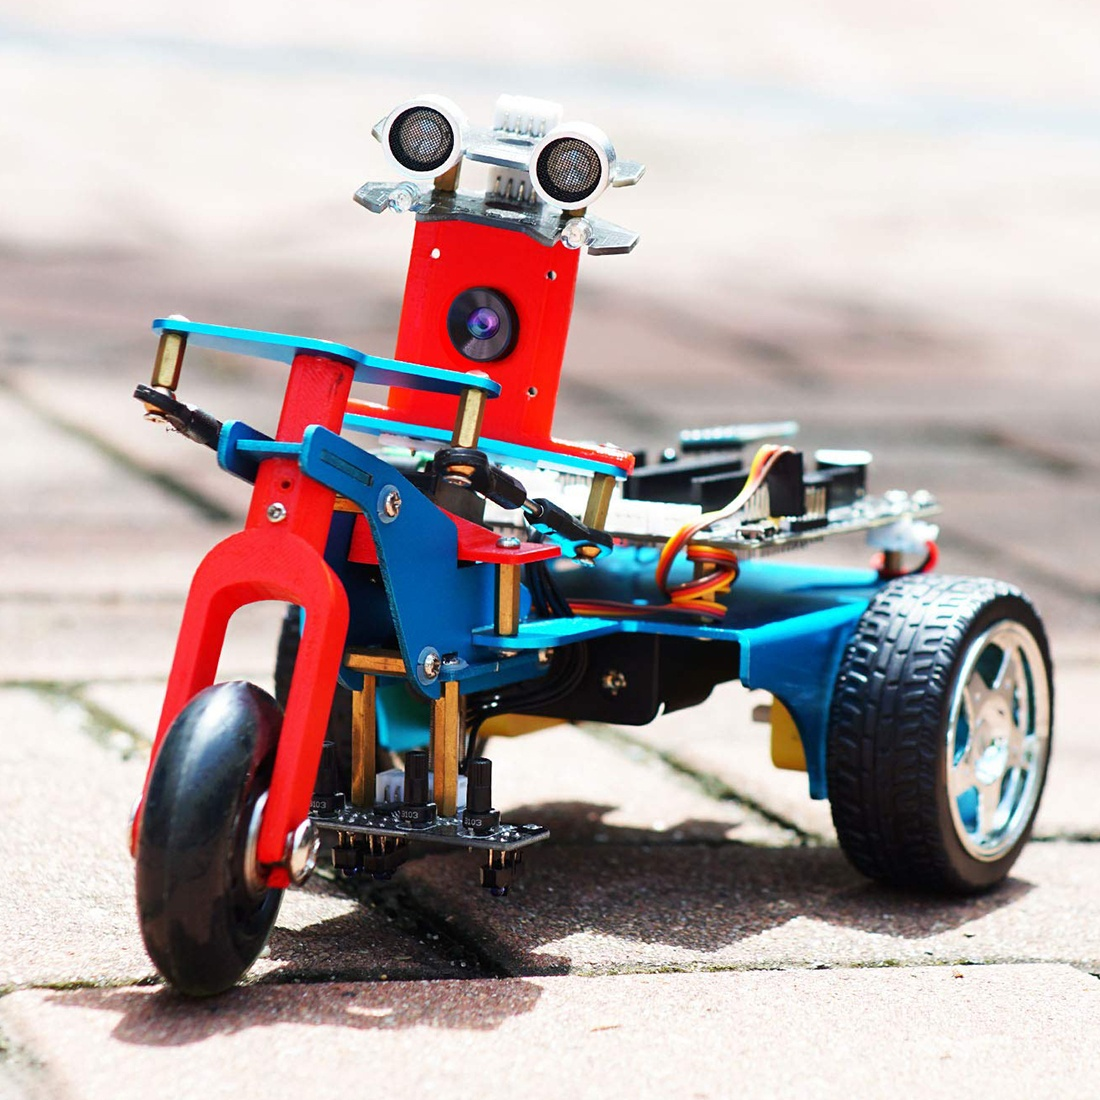 Особенности трехколесного умного робота с HD камерой на Raspberry 4B